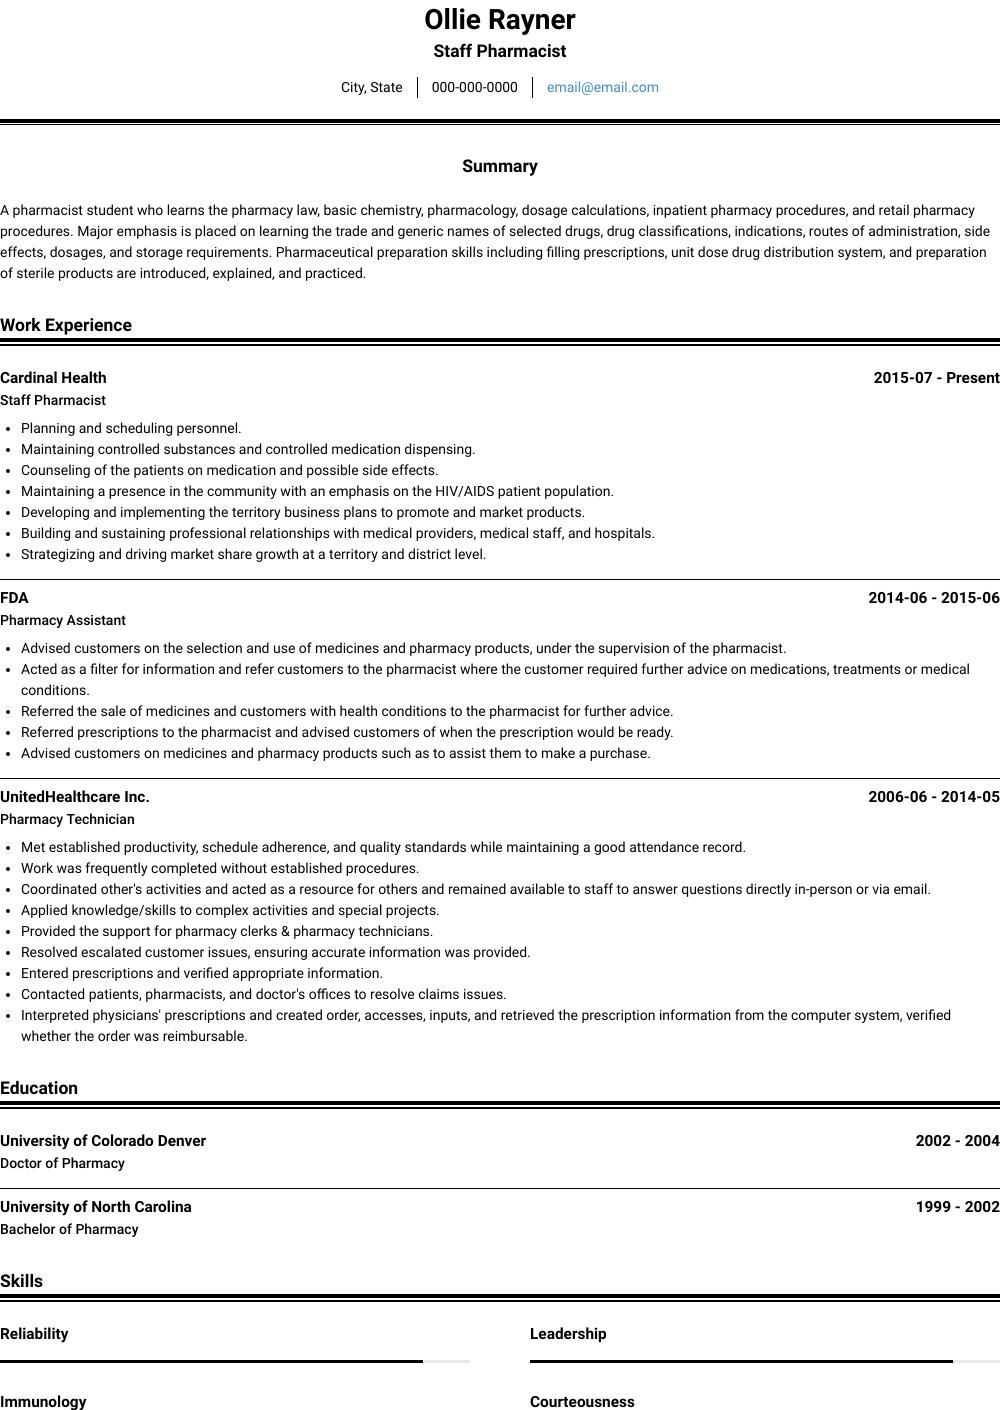 Pharmacist Resume Samples Templates Visualcv